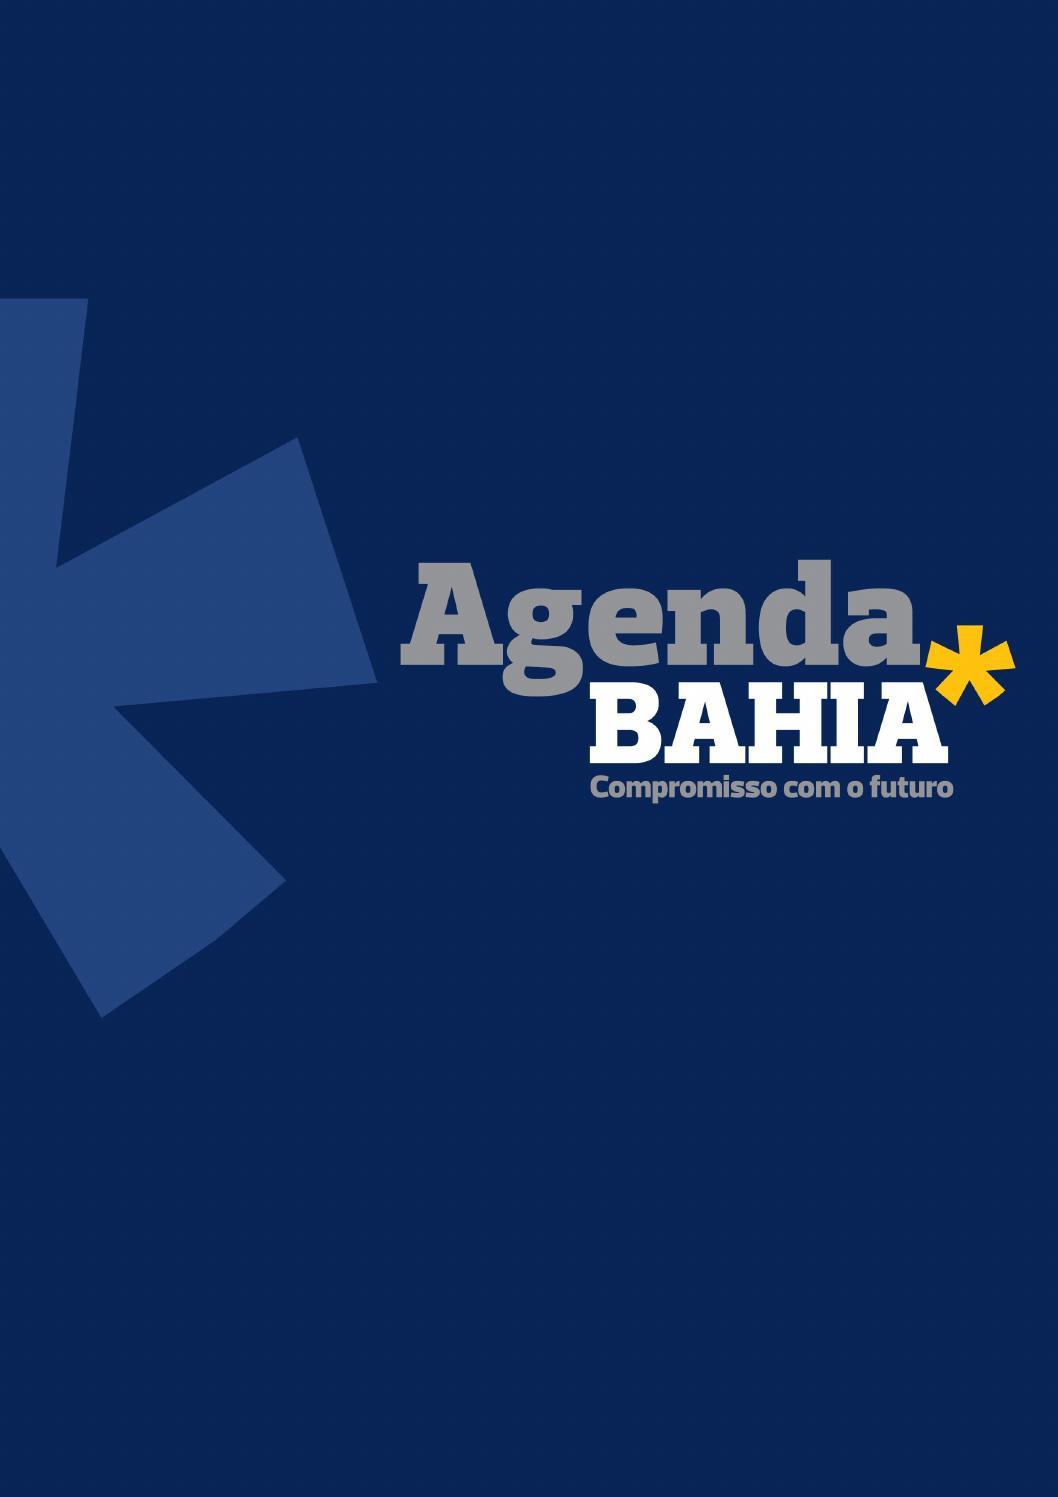 Livro Agenda Bahia 2014 by Jornal Correio - issuu 7ba86eff28a64